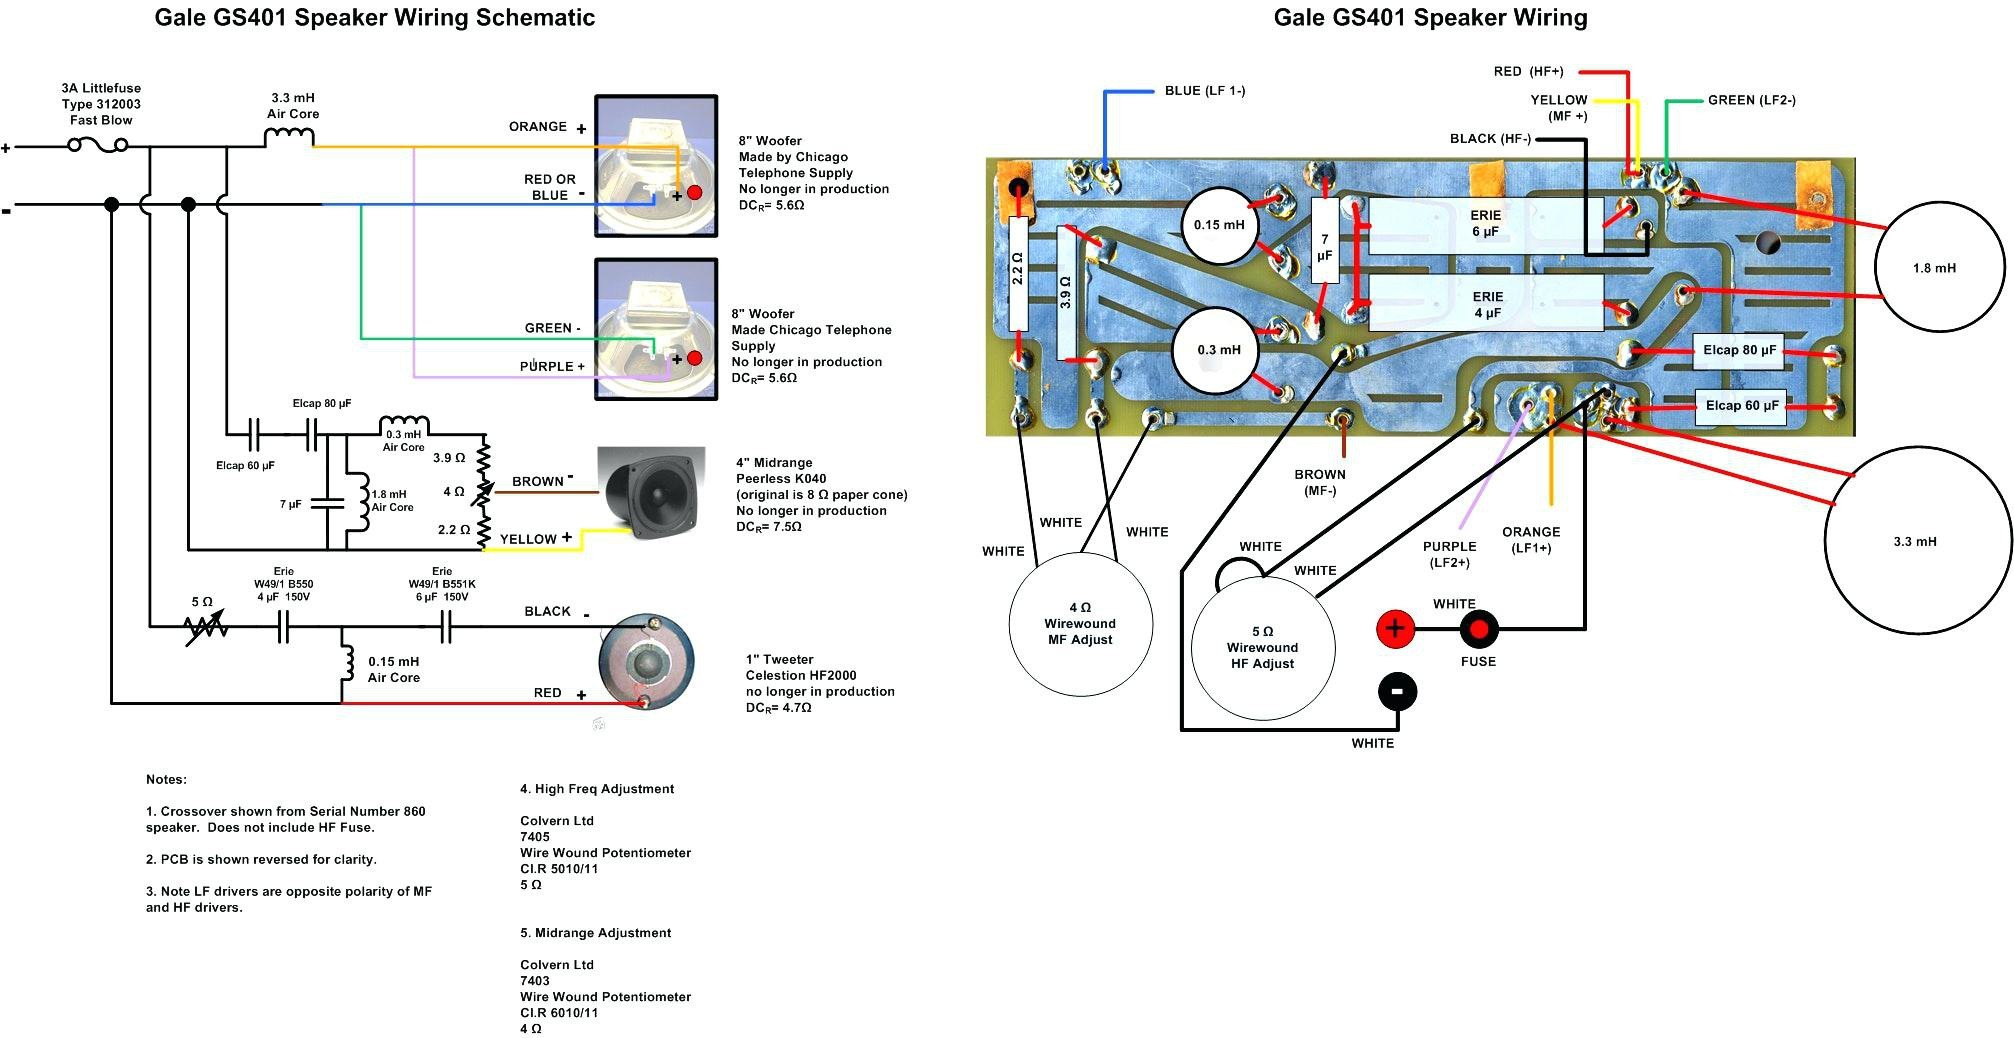 Speaker Crossover Wiring Diagram Beautiful Speaker Crossover Wiring Diagram Wiring